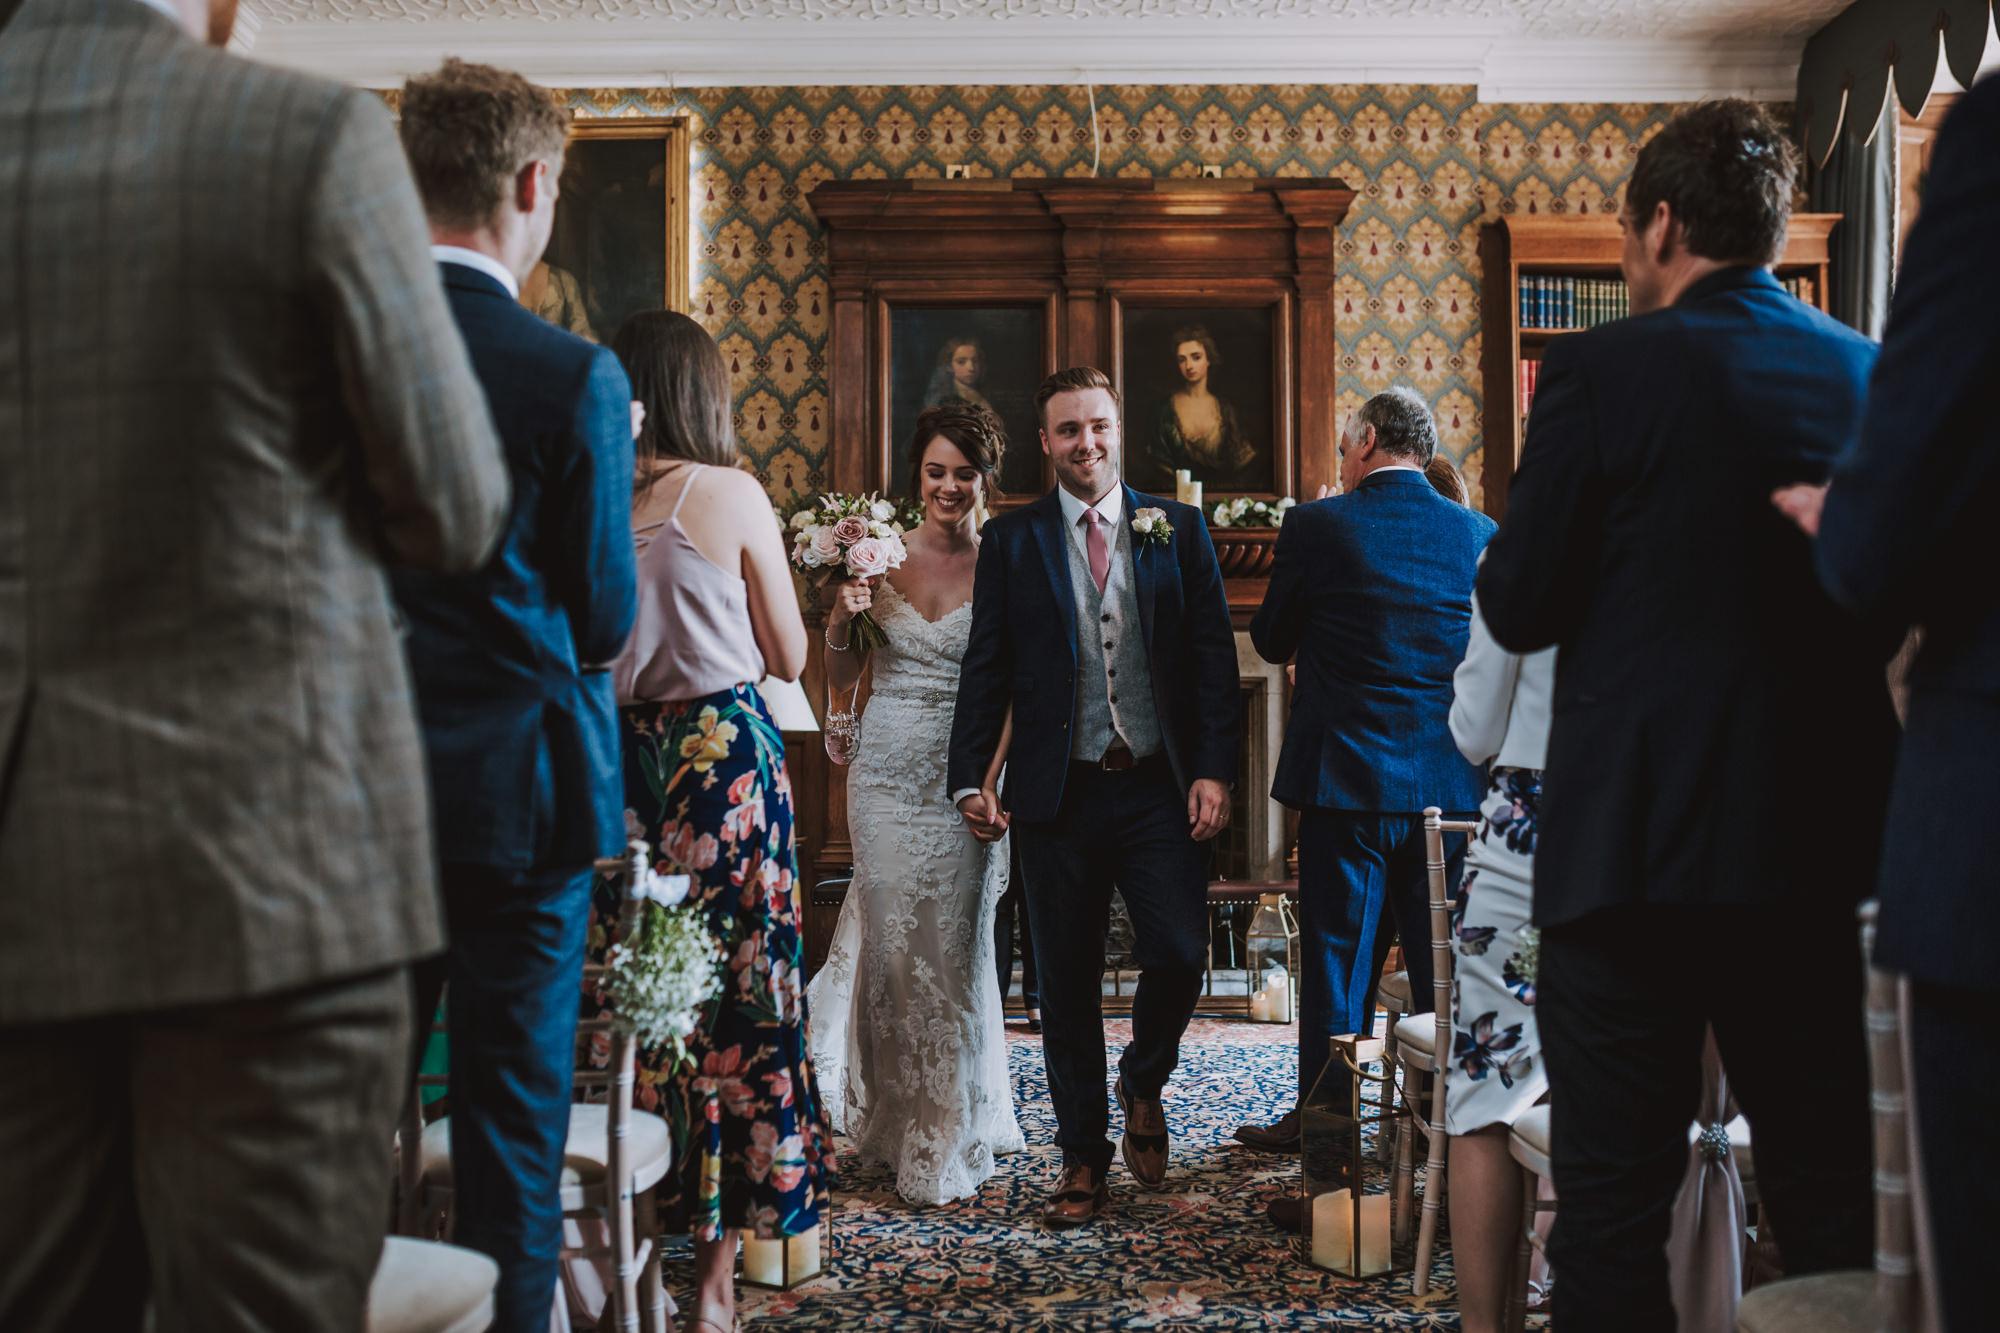 hodsock priory wedding photographers blog46.jpg